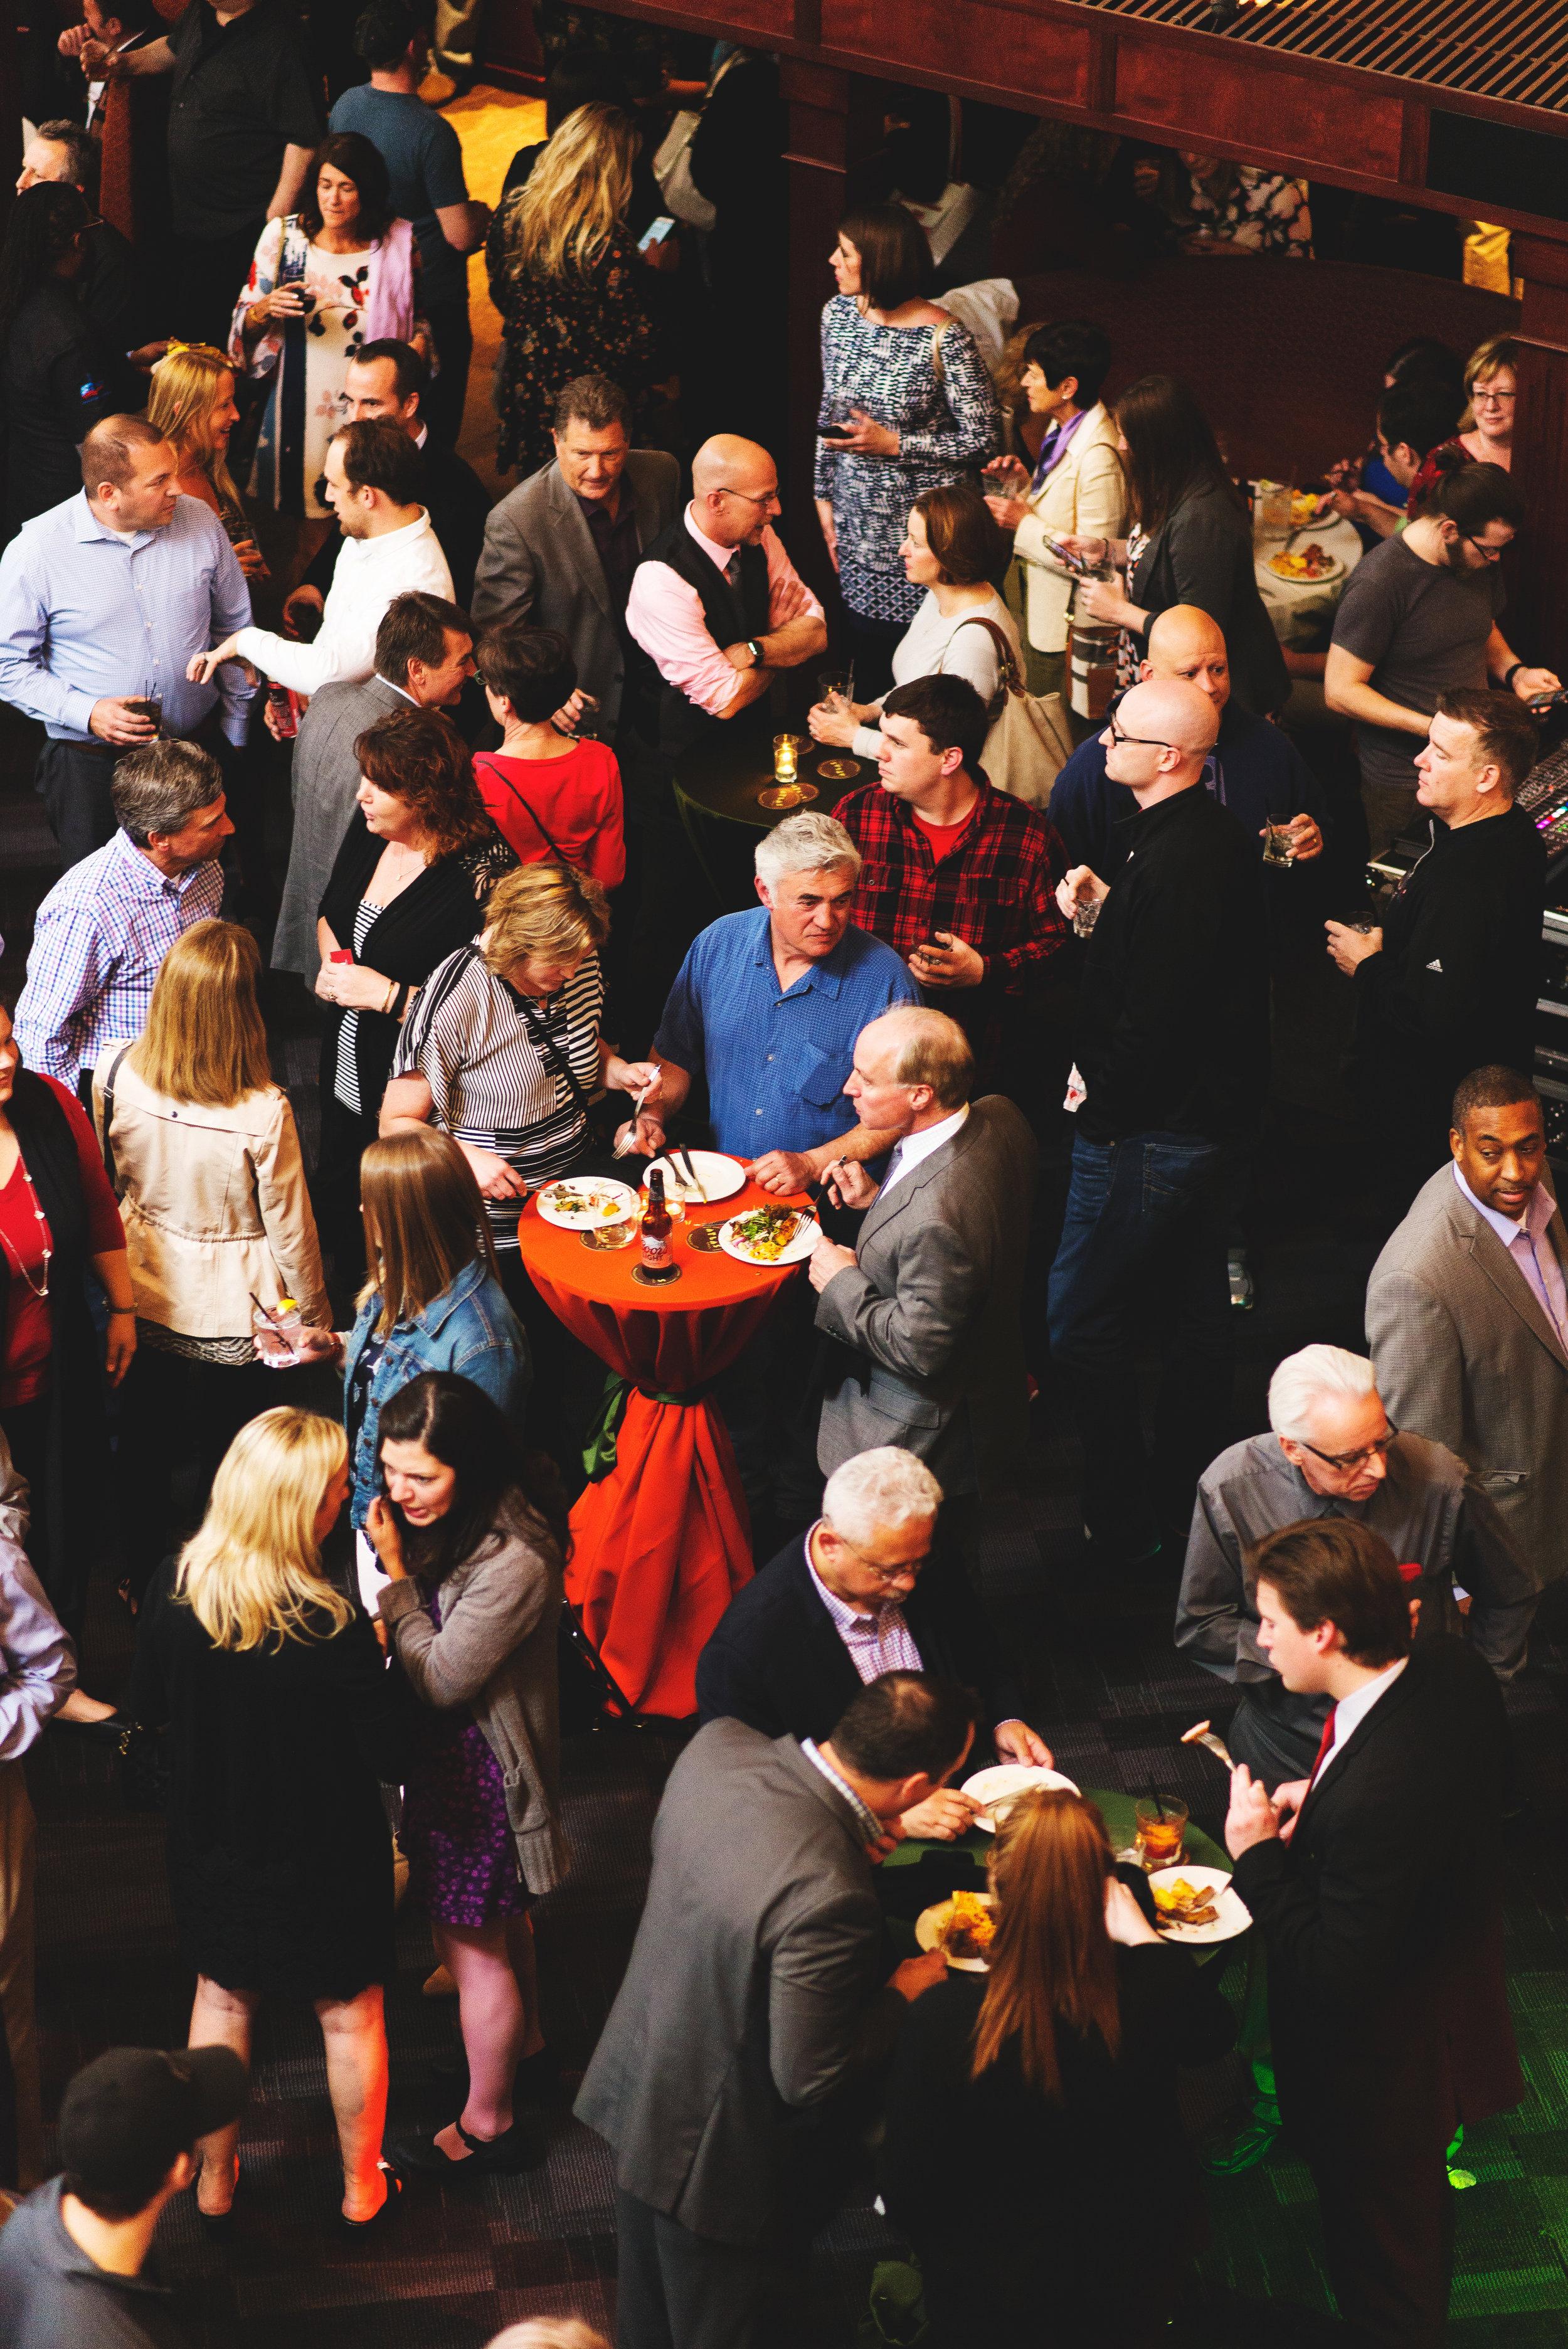 FoodFanaticsLive-Event-Food-Photography070.jpg